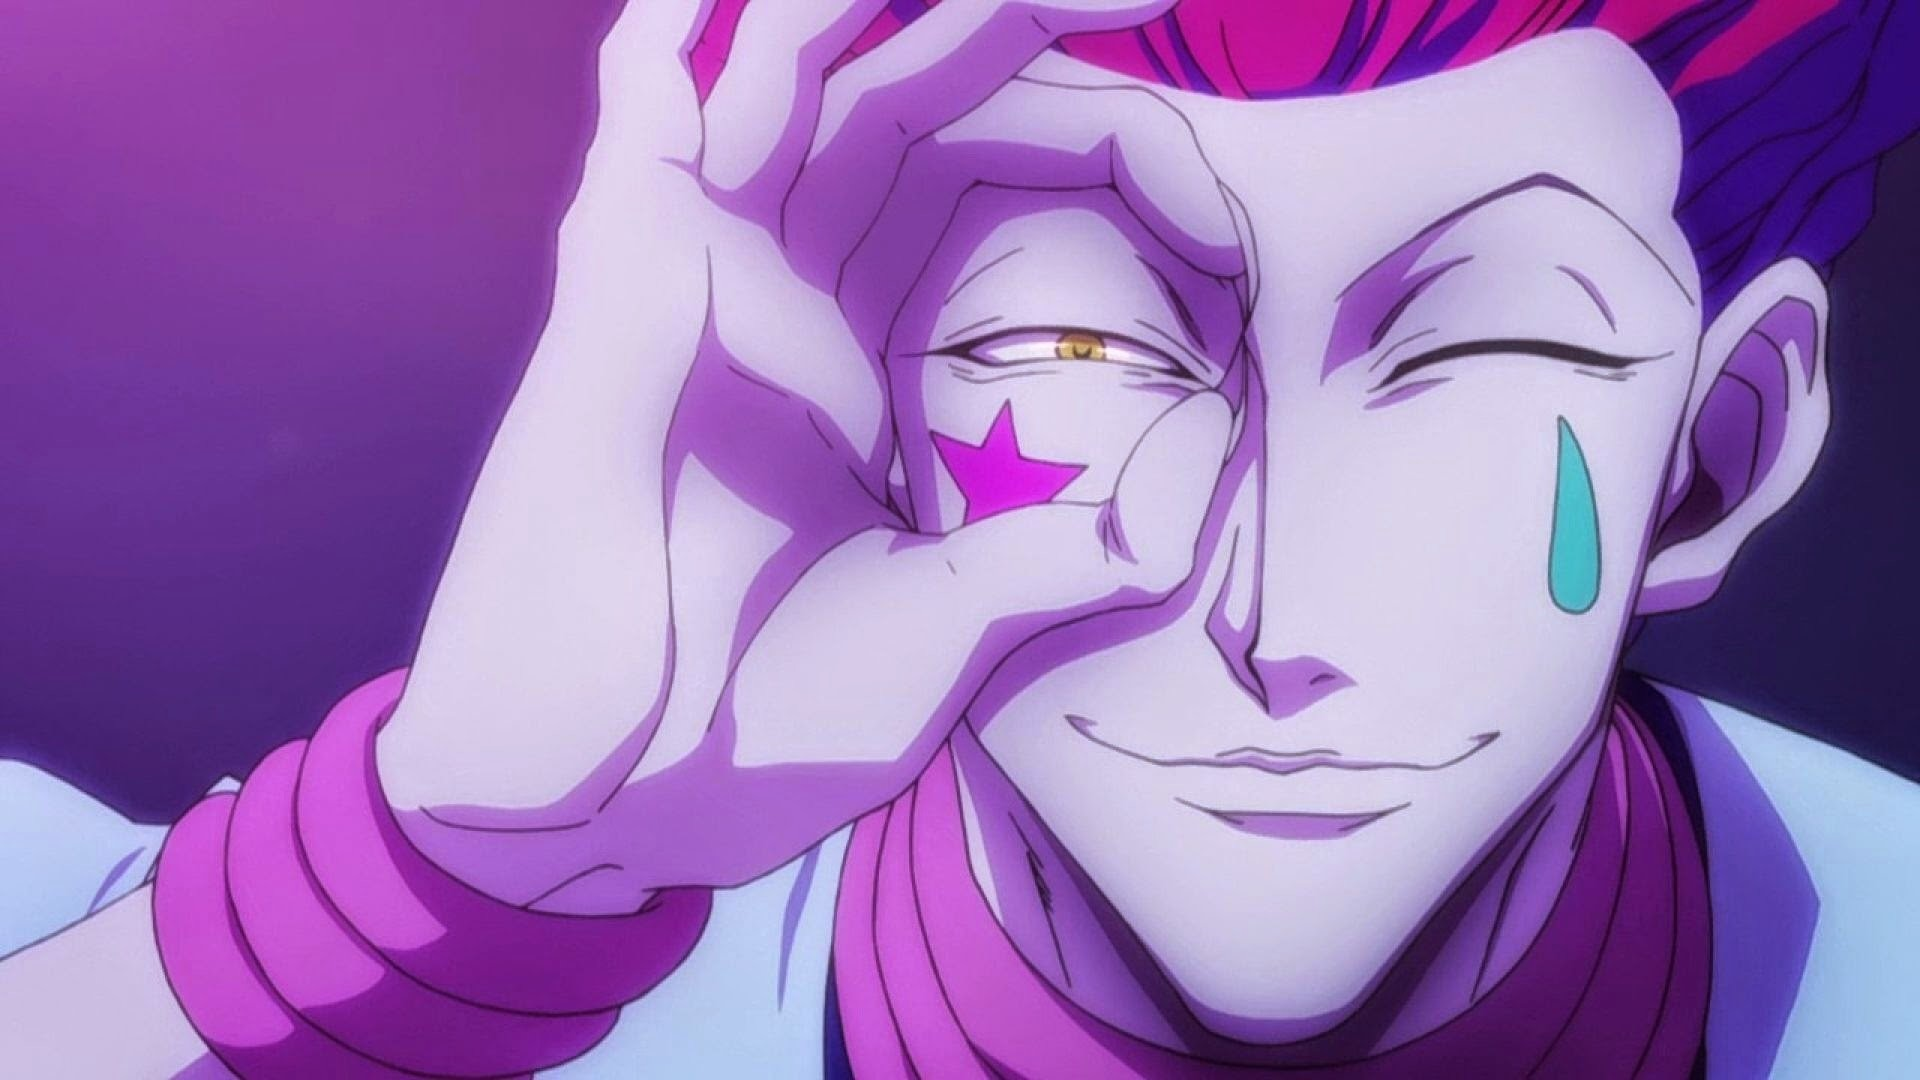 Fondo de pantalla HD | Fondo de Escritorio ID:637345. Anime Hunter  x Hunter. 62 Me Gusta. Favorito